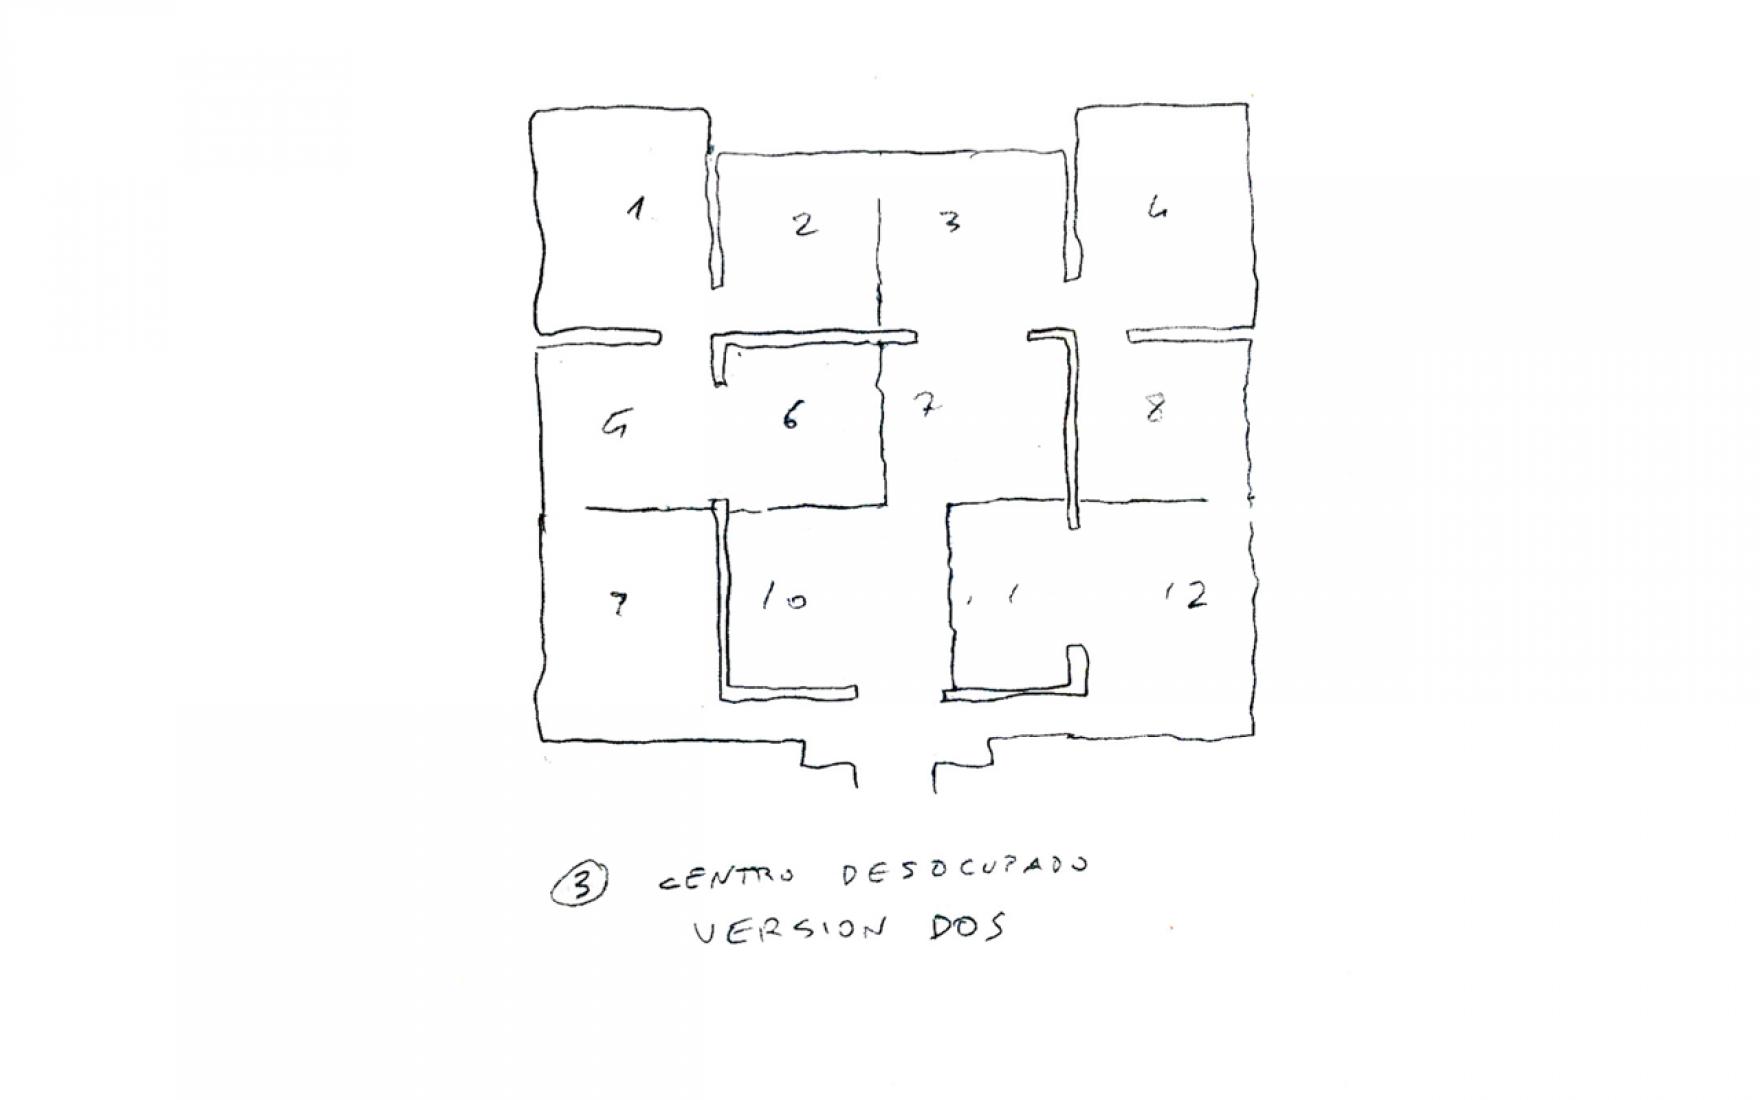 Previous schemes, Iñaki Ábalos. The Labyrinth ot Labyrinths. Spanish Pavilion Biennale di Venezia 2014. Image © courtesy of curatorship team.